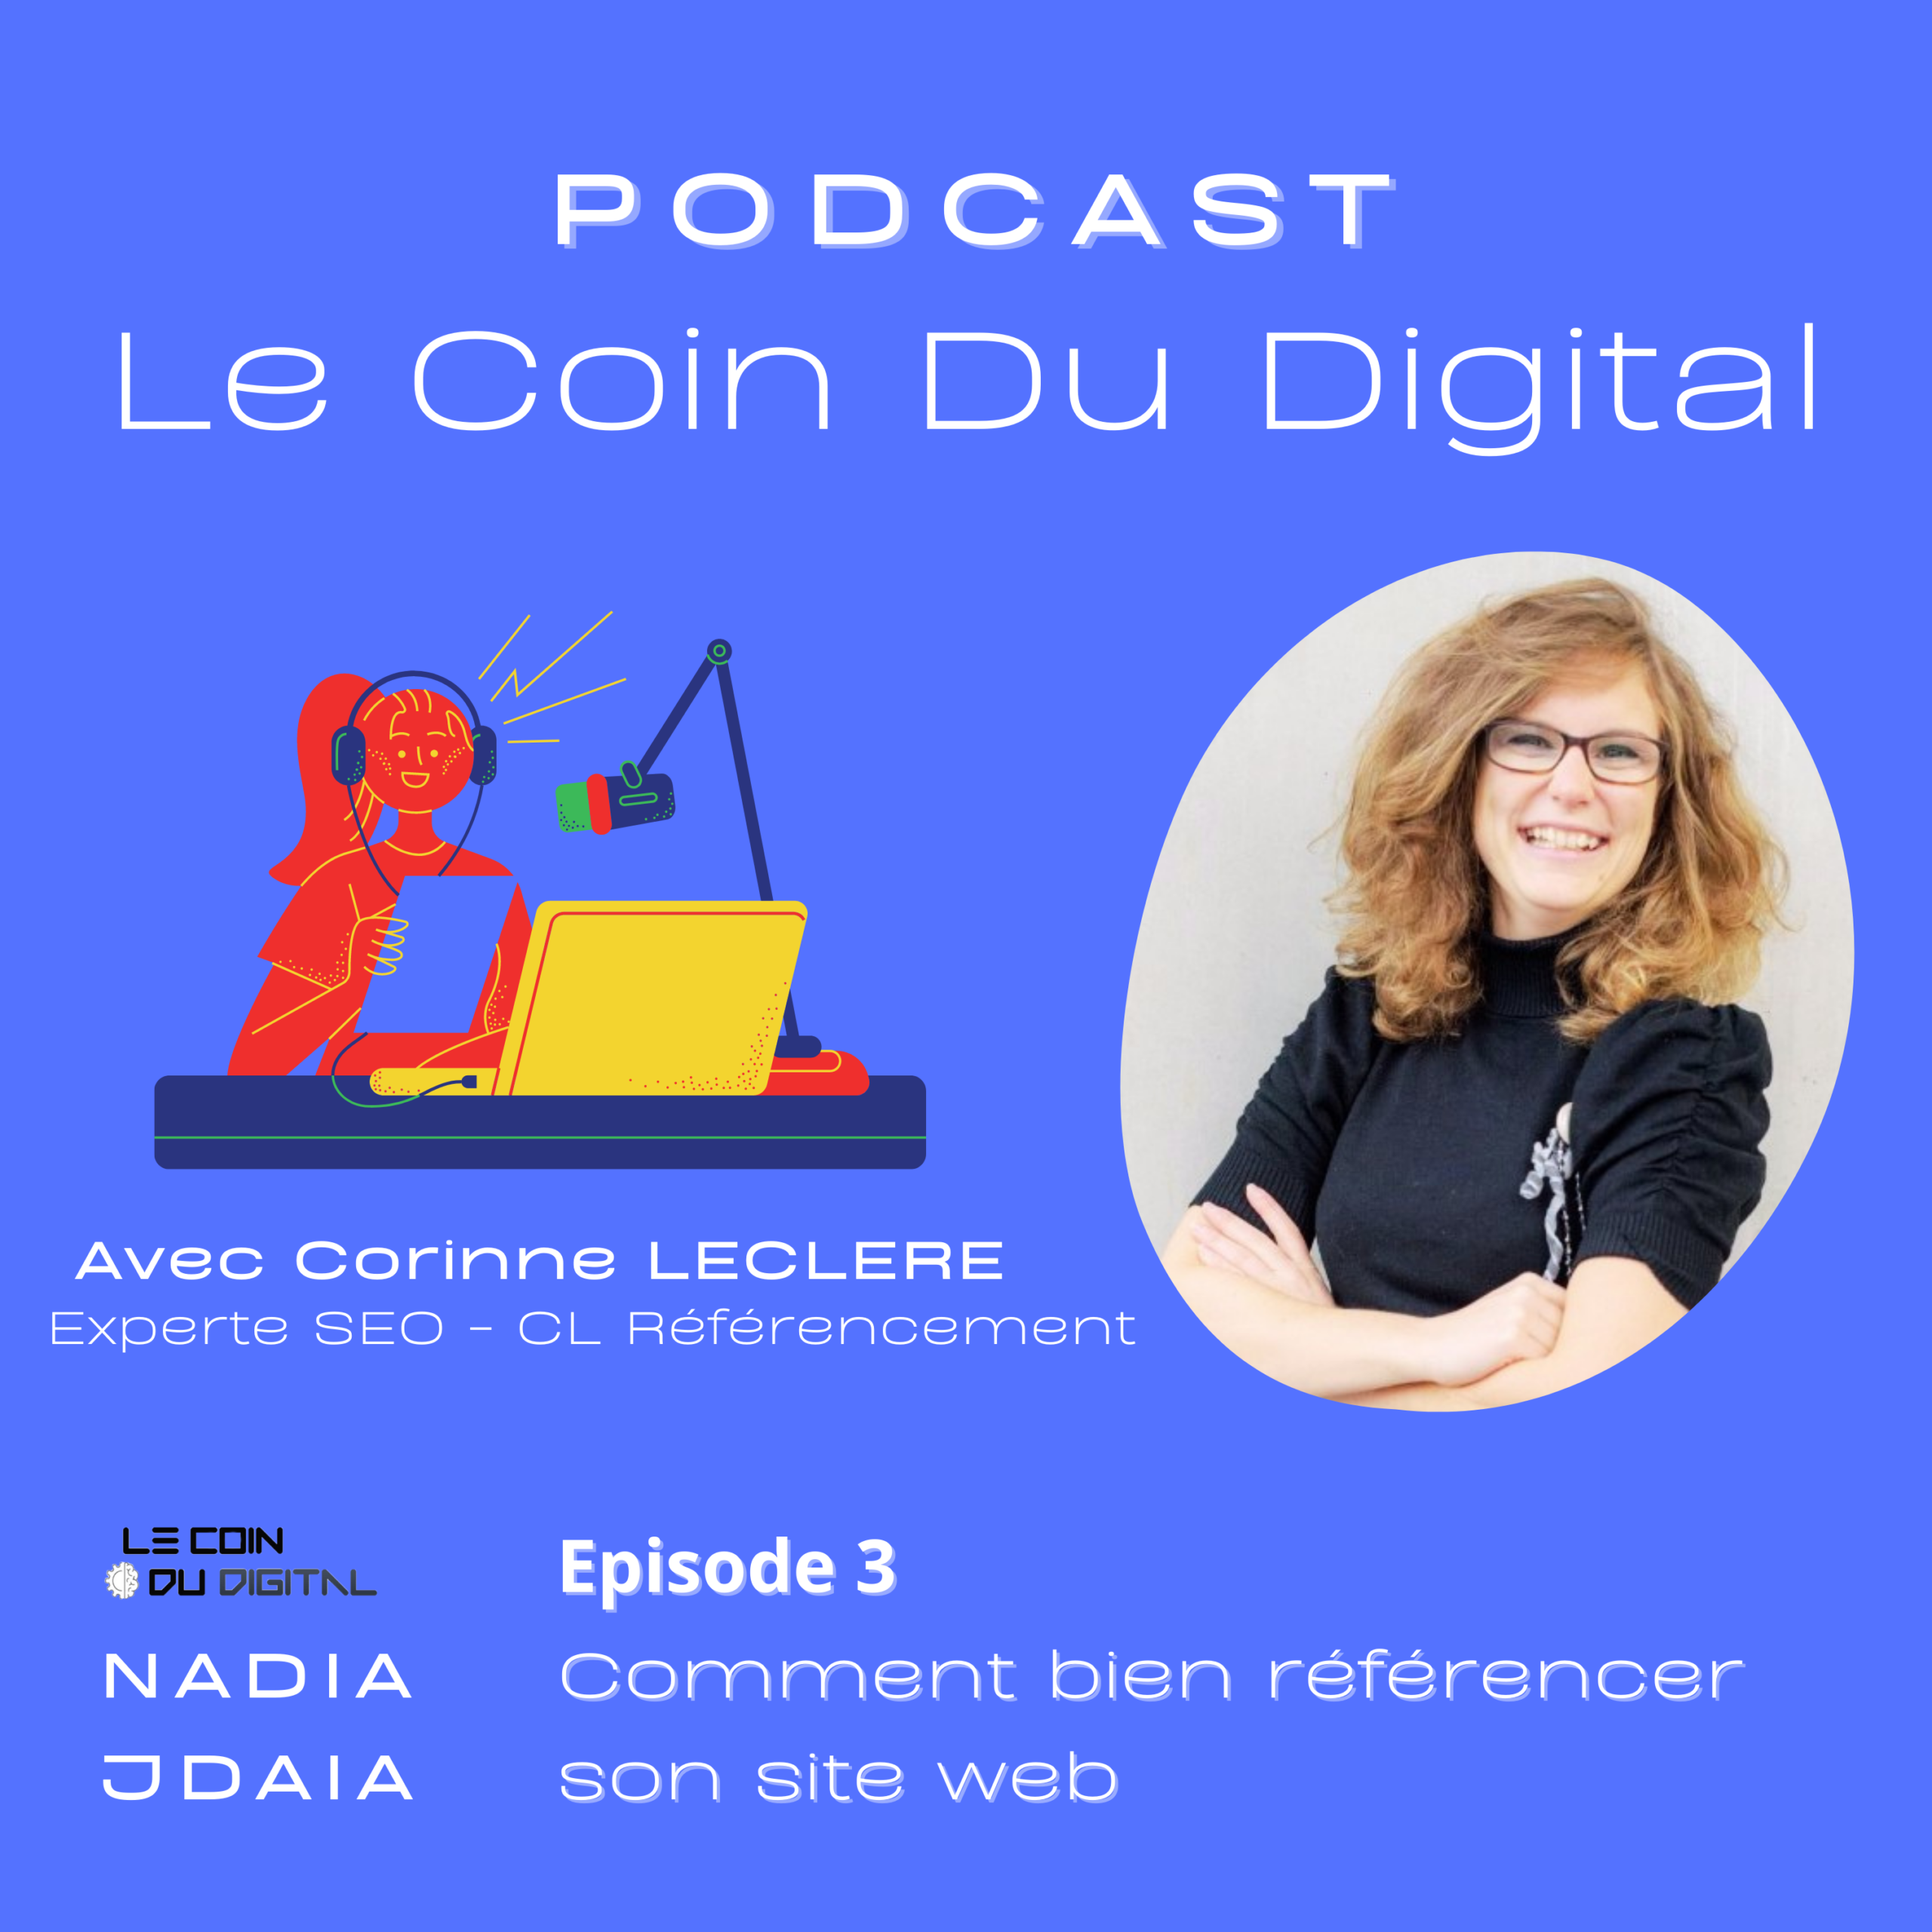 Podcast SEO référencement Madame Monsieur Agency agence de stratégie digitale Mulhouse growth marketing Mulhouse